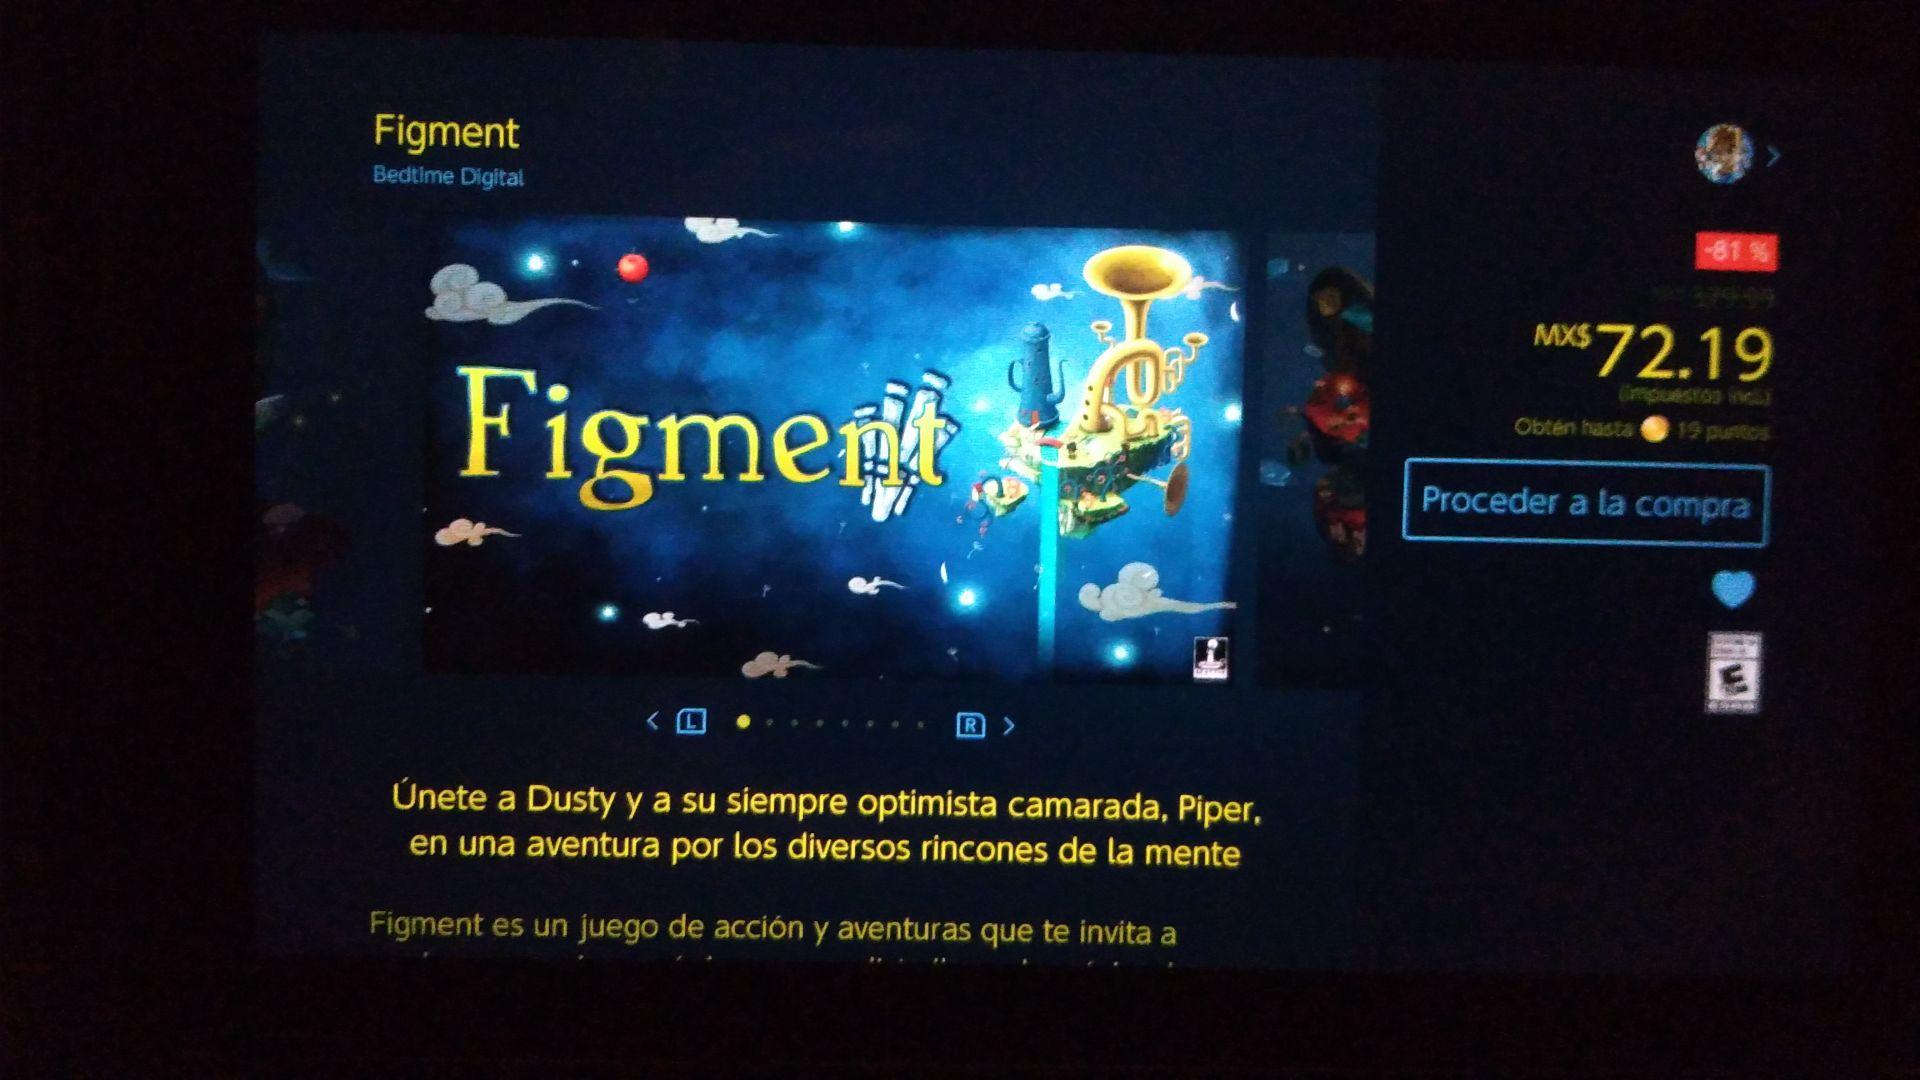 Nintendo eshop (Switch): Figment